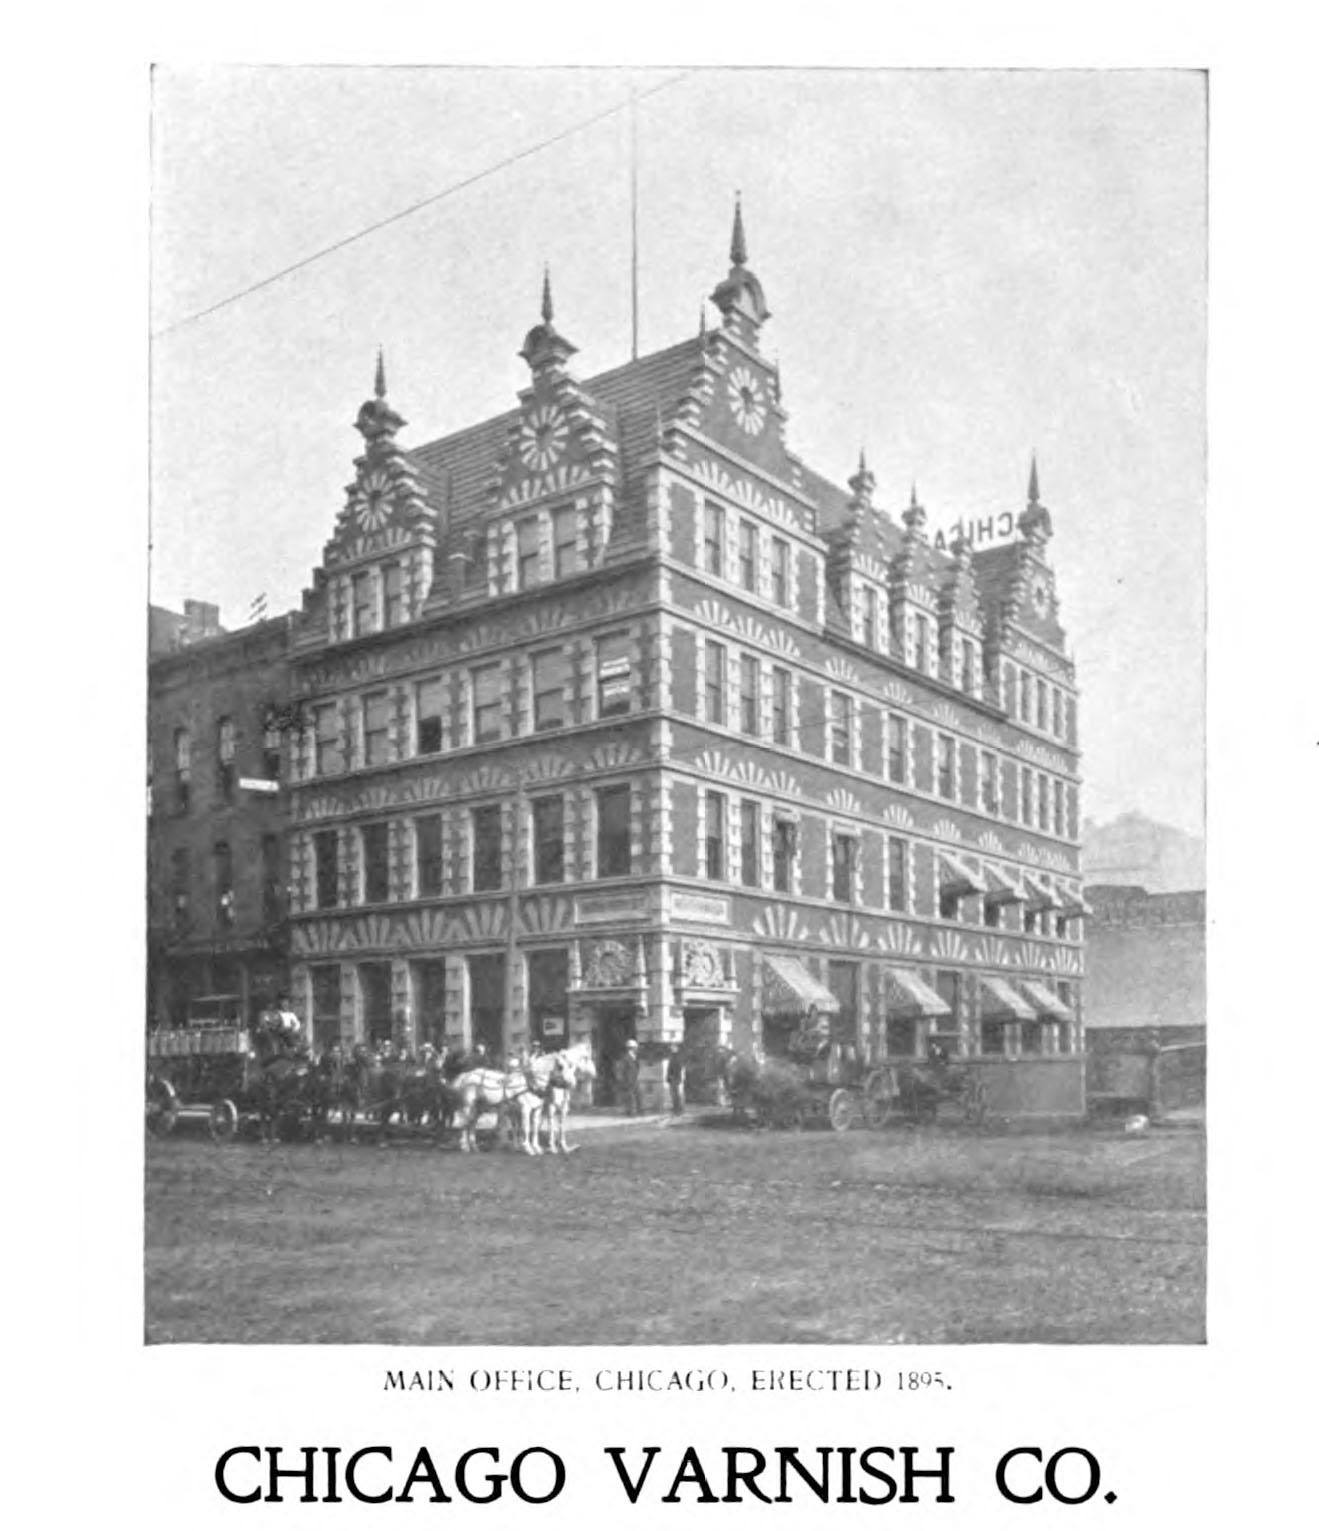 Chicago Varnish Company